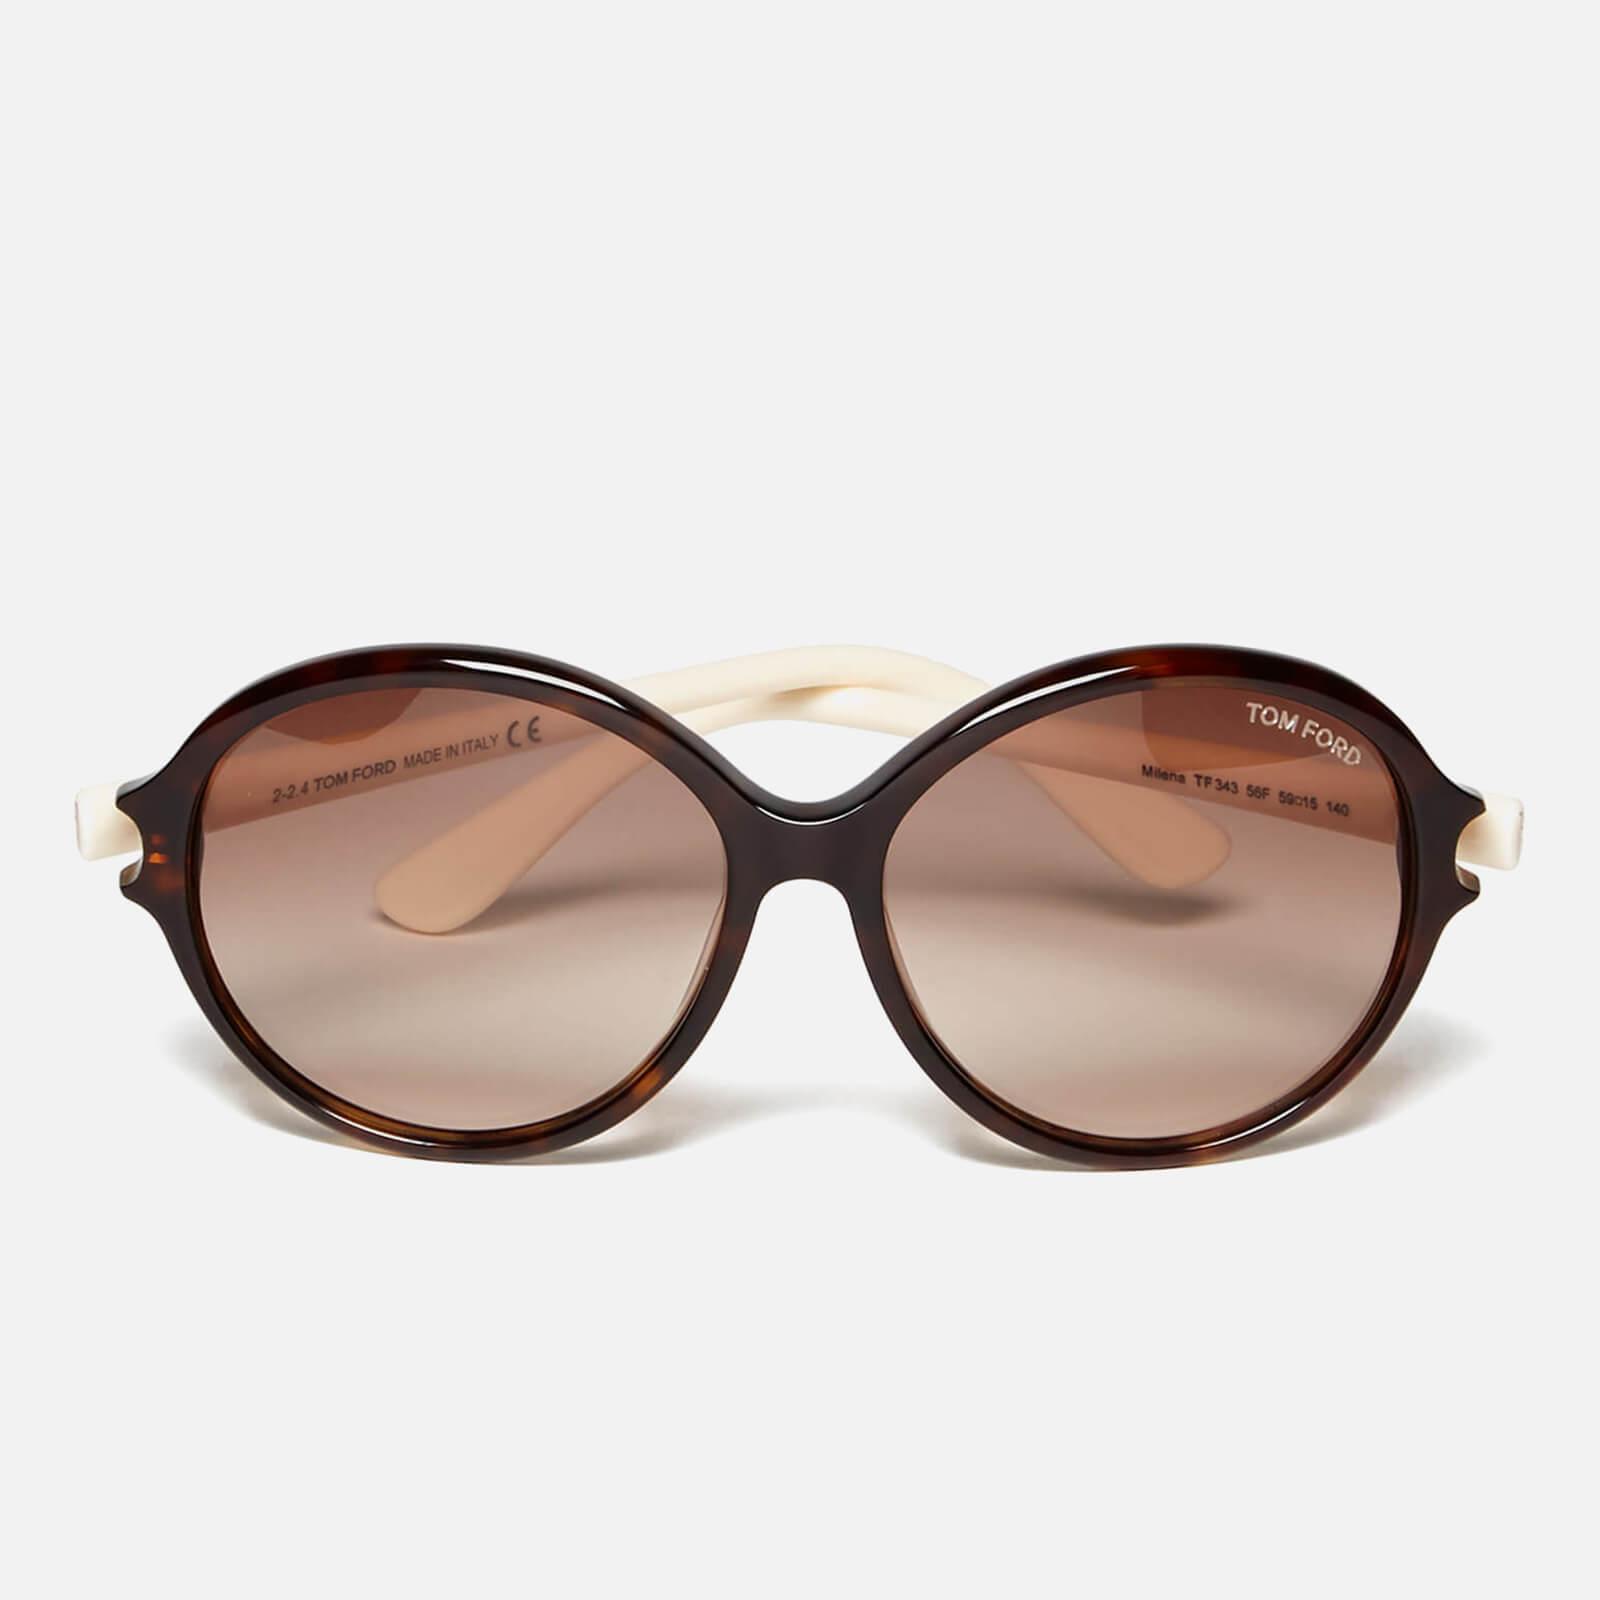 763ec1e33b75 Tom Ford Women s Milena Sunglasses - Black White - Free UK Delivery over £50